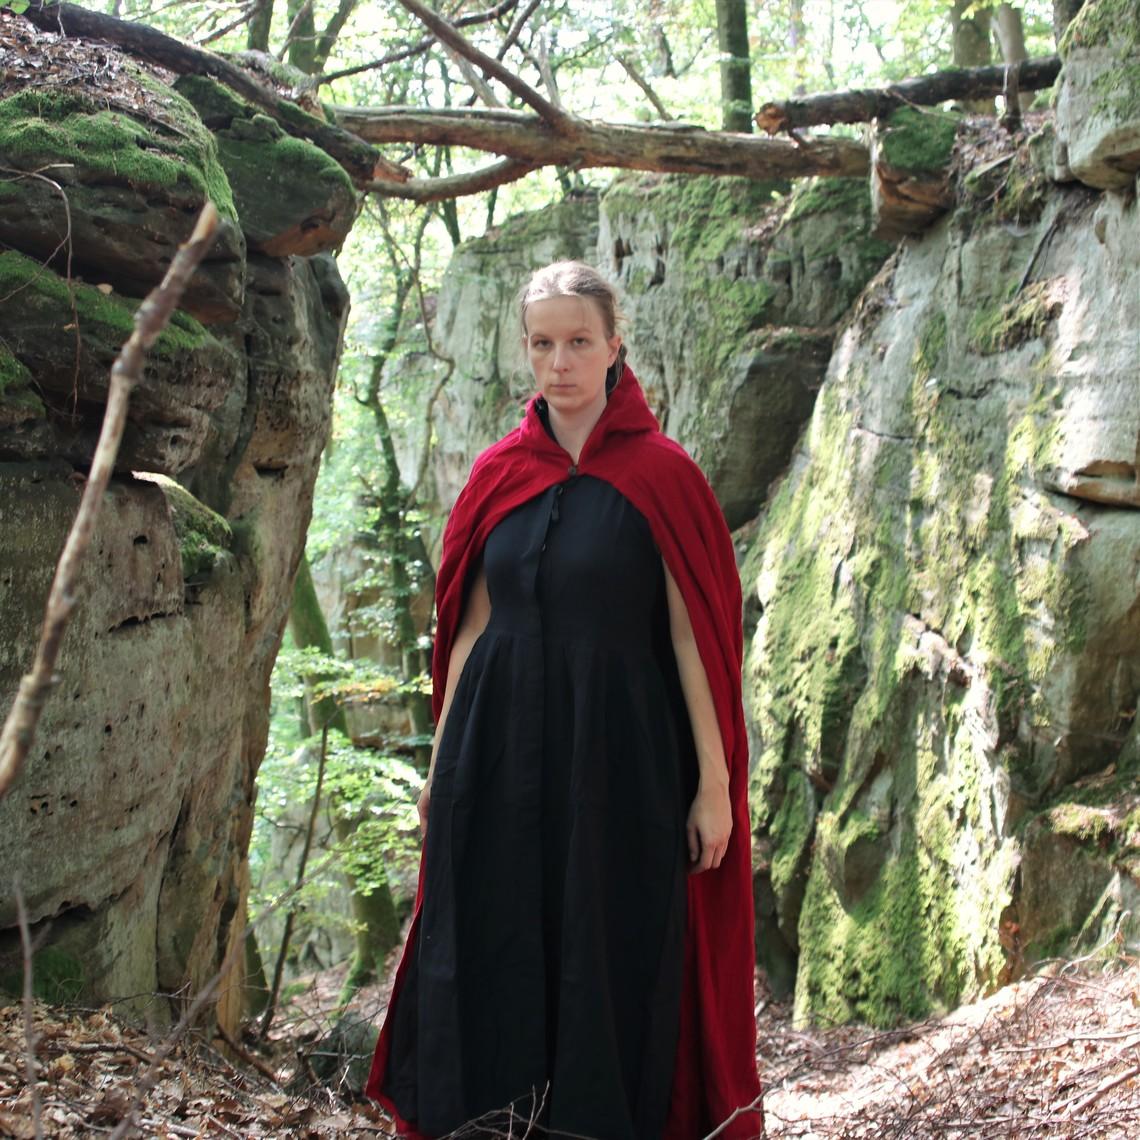 Leonardo Carbone Fluwelen mantel zonder voering, rood